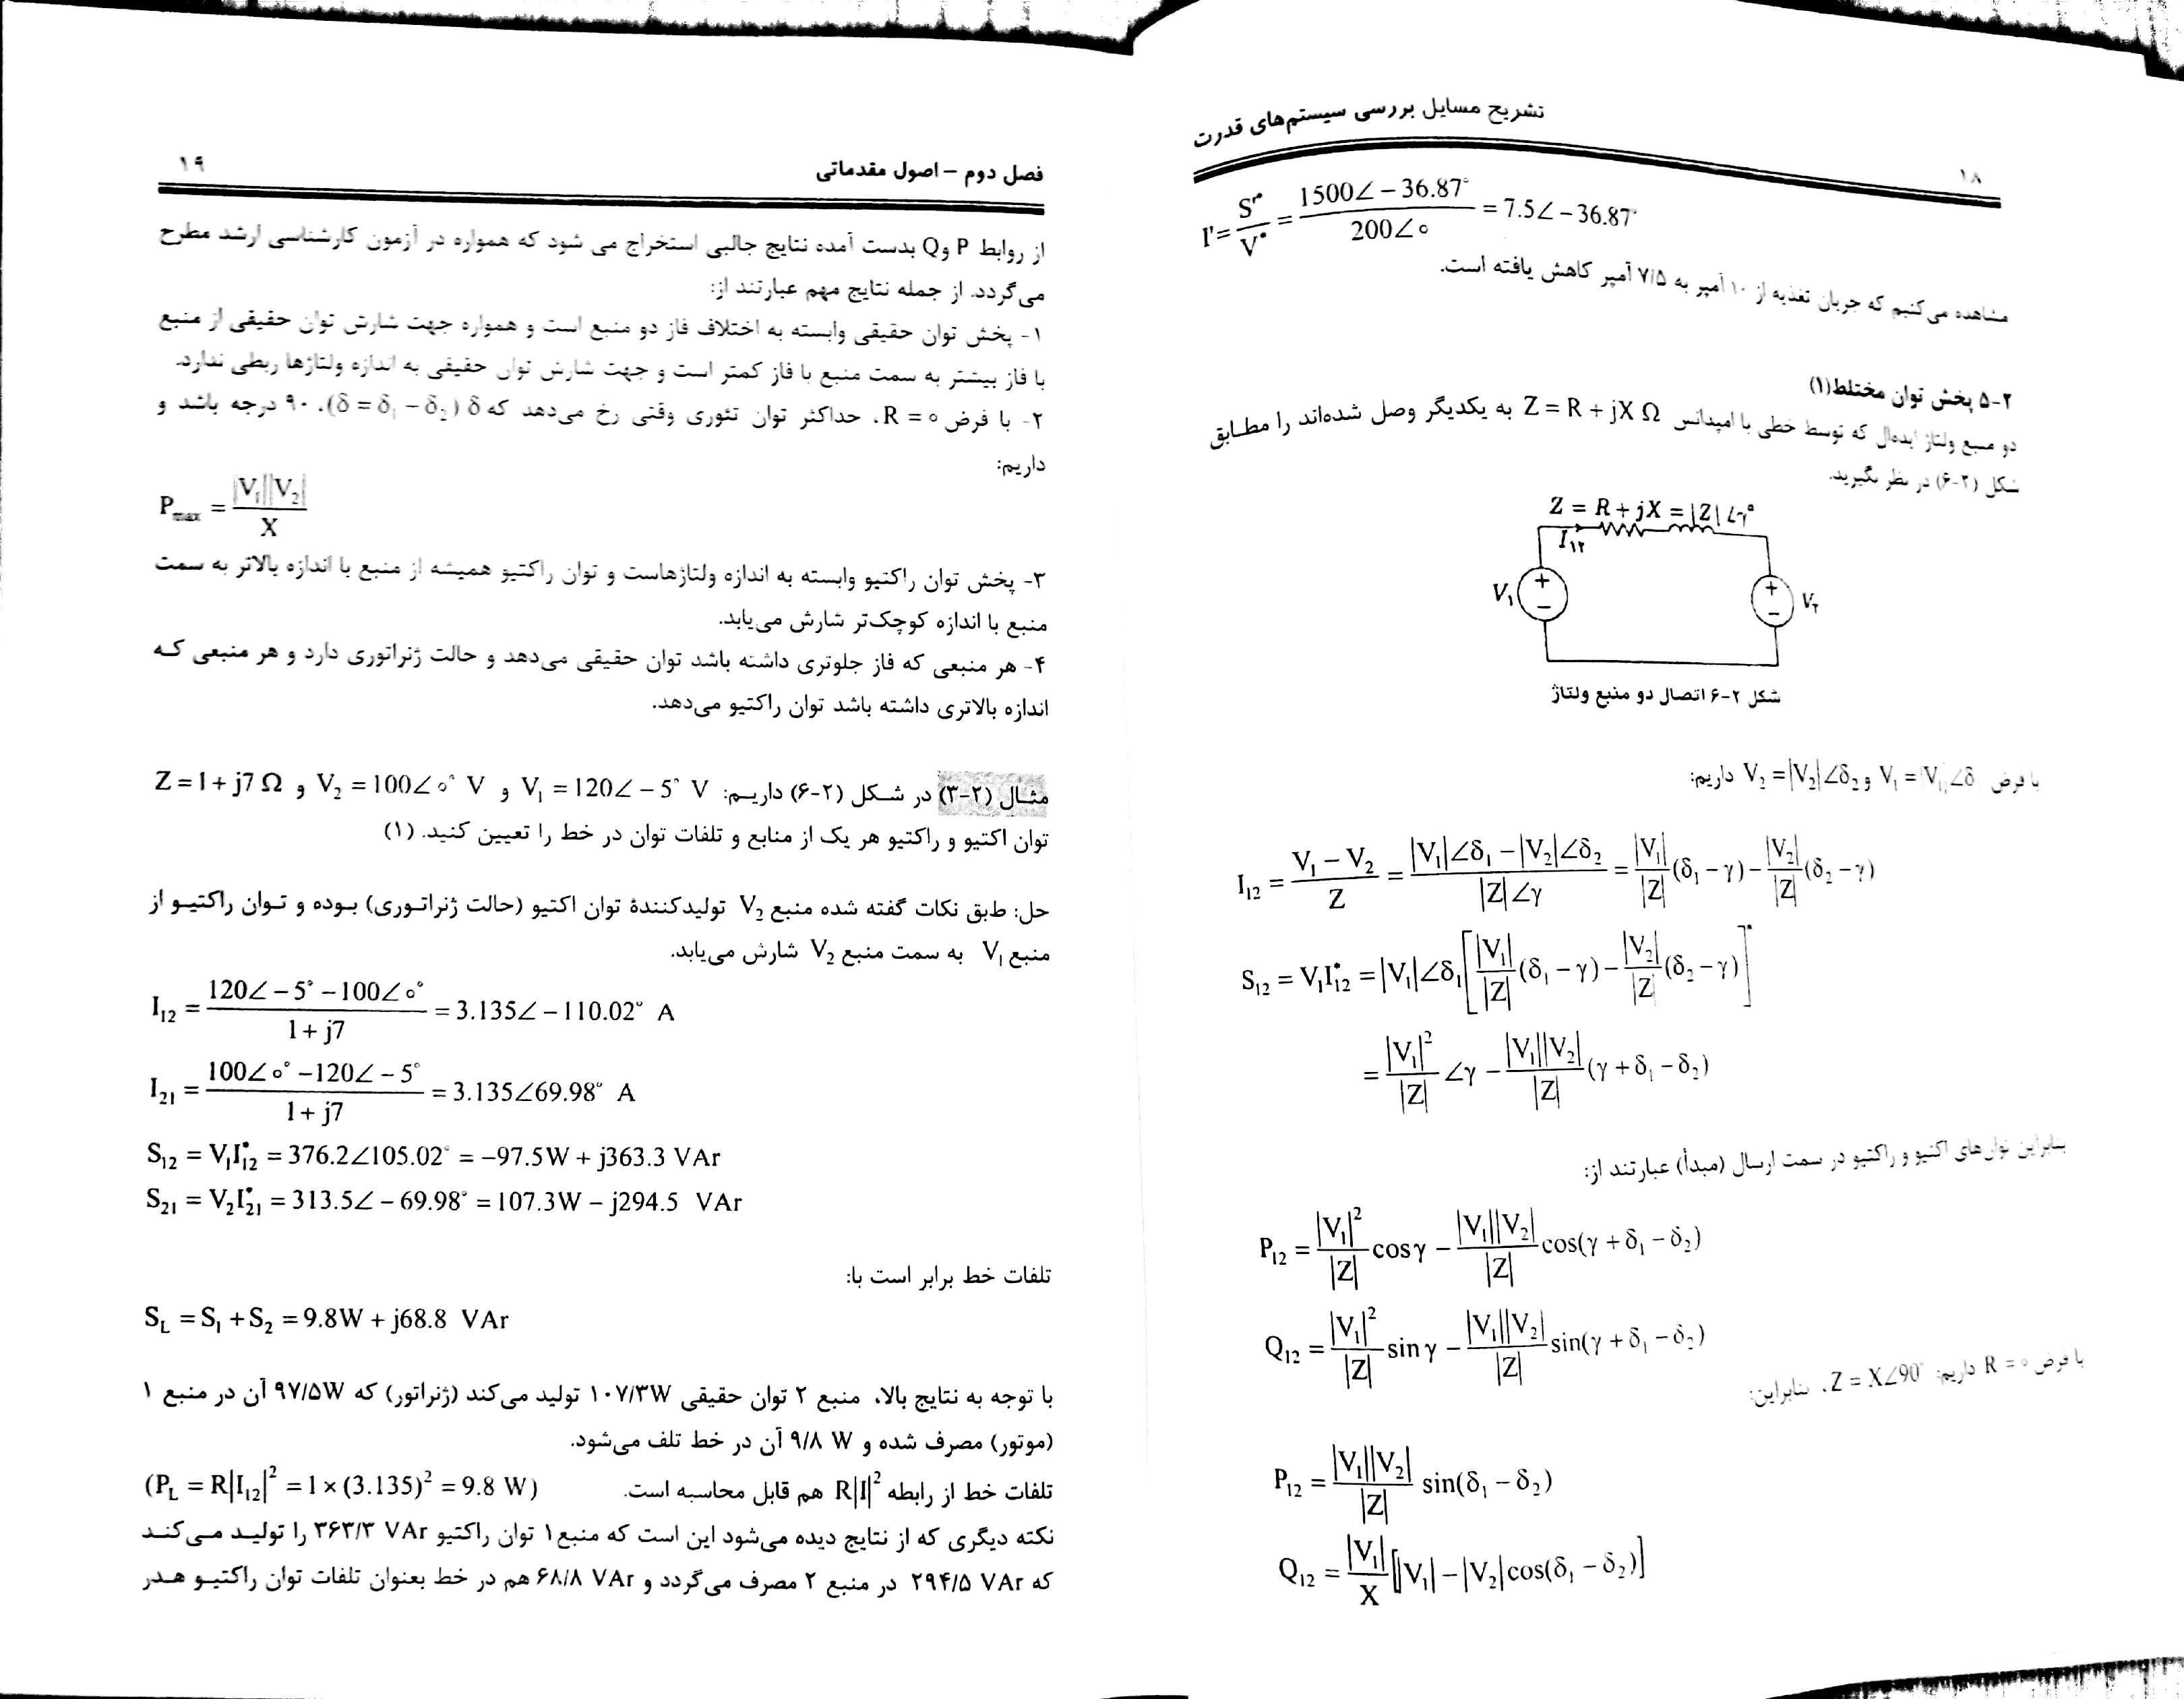 حل المسائل کتاب بررسی 1 هادی سعادت فارسی